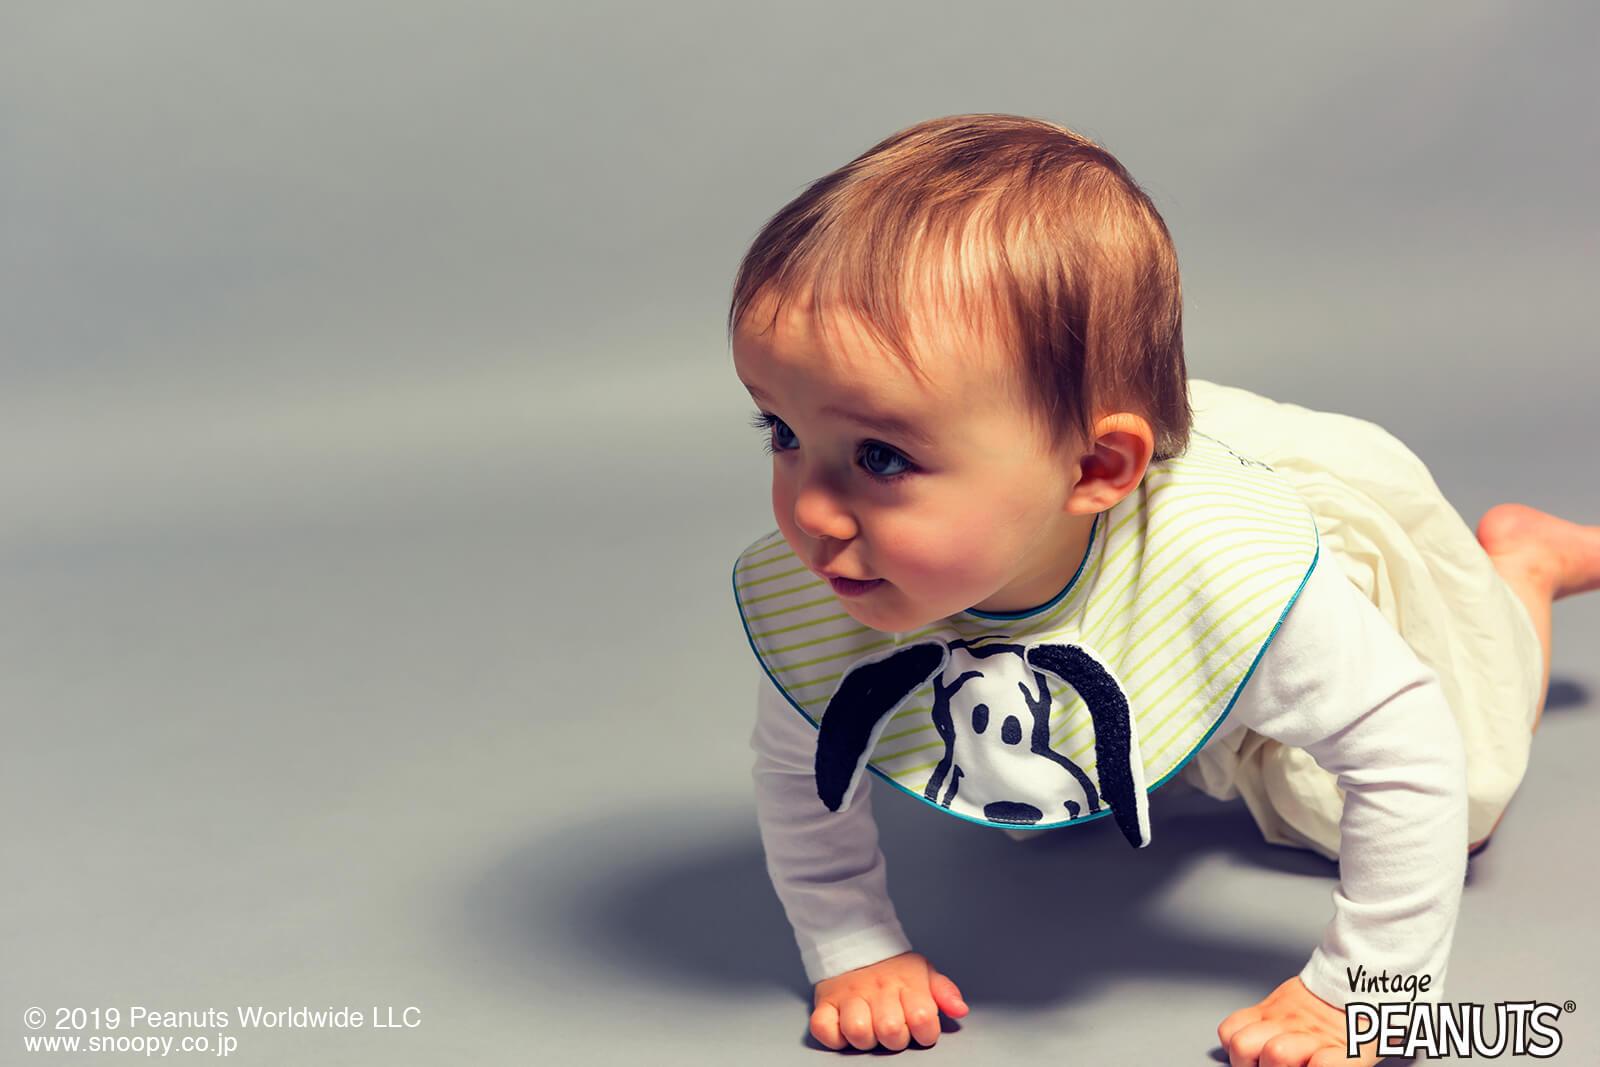 PEANUTSコラボ第3弾アイテム 発売開始 | 出産祝い・ギフトならMARLMARLのスタイ